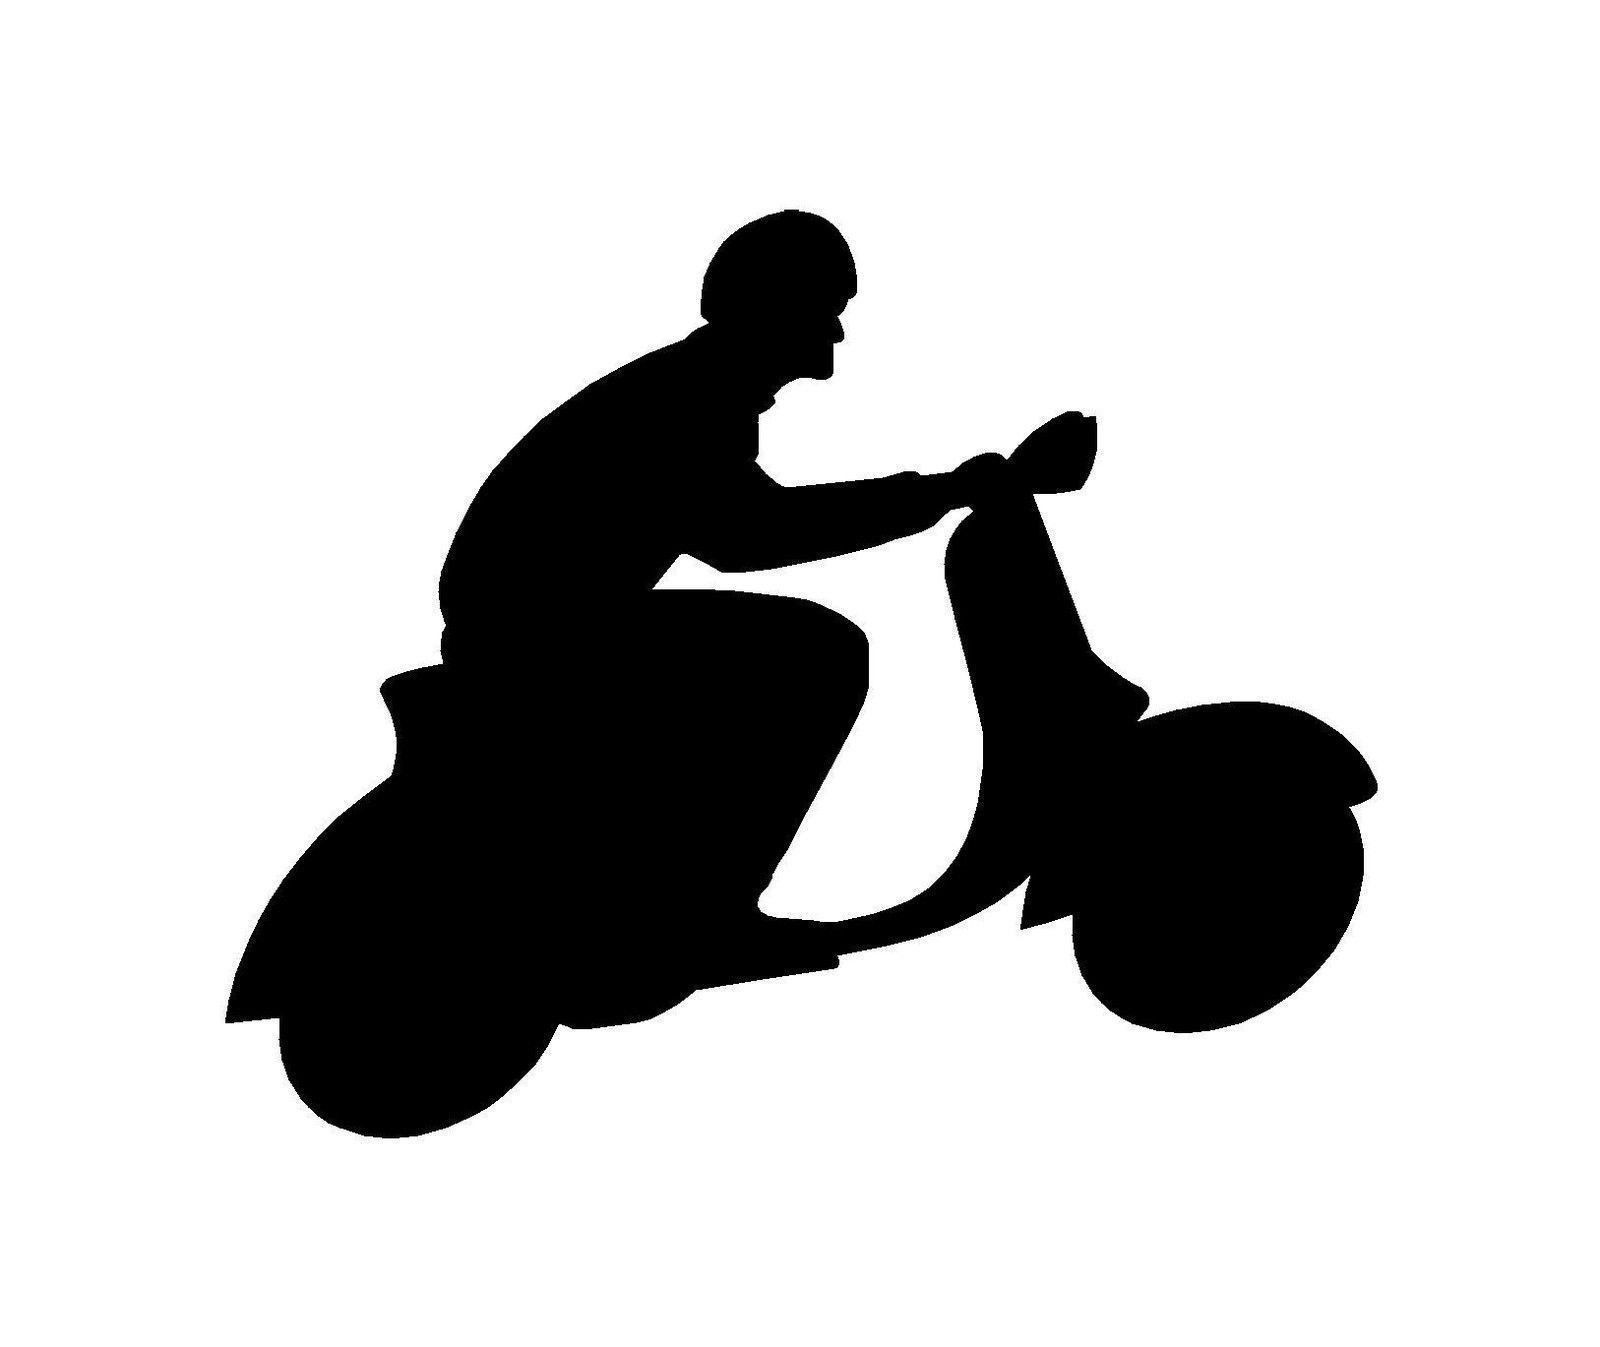 Scooter vespa motorbike outline logo sticker decal graphic